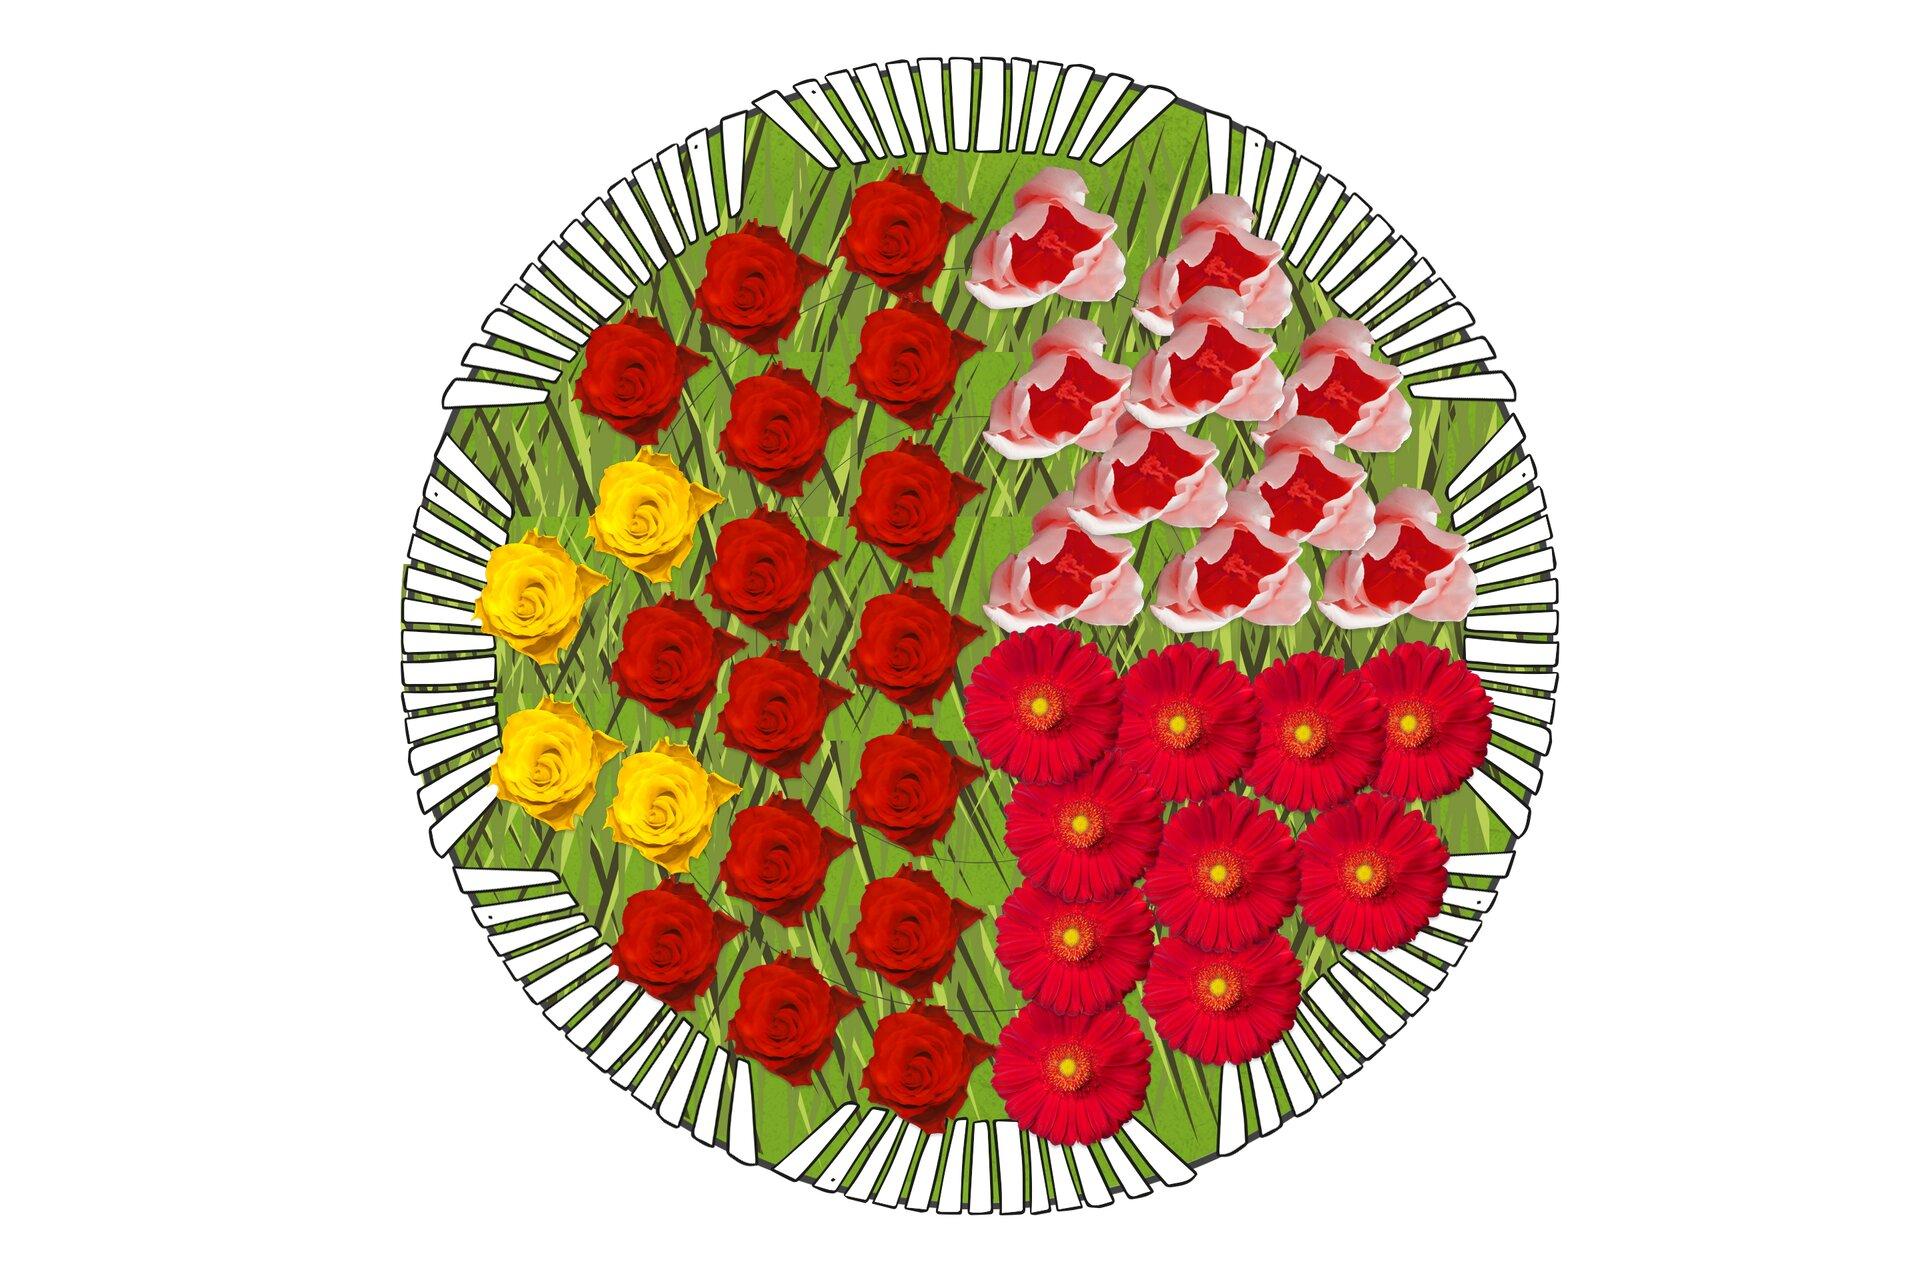 Rysunek klombu zkwiatami.